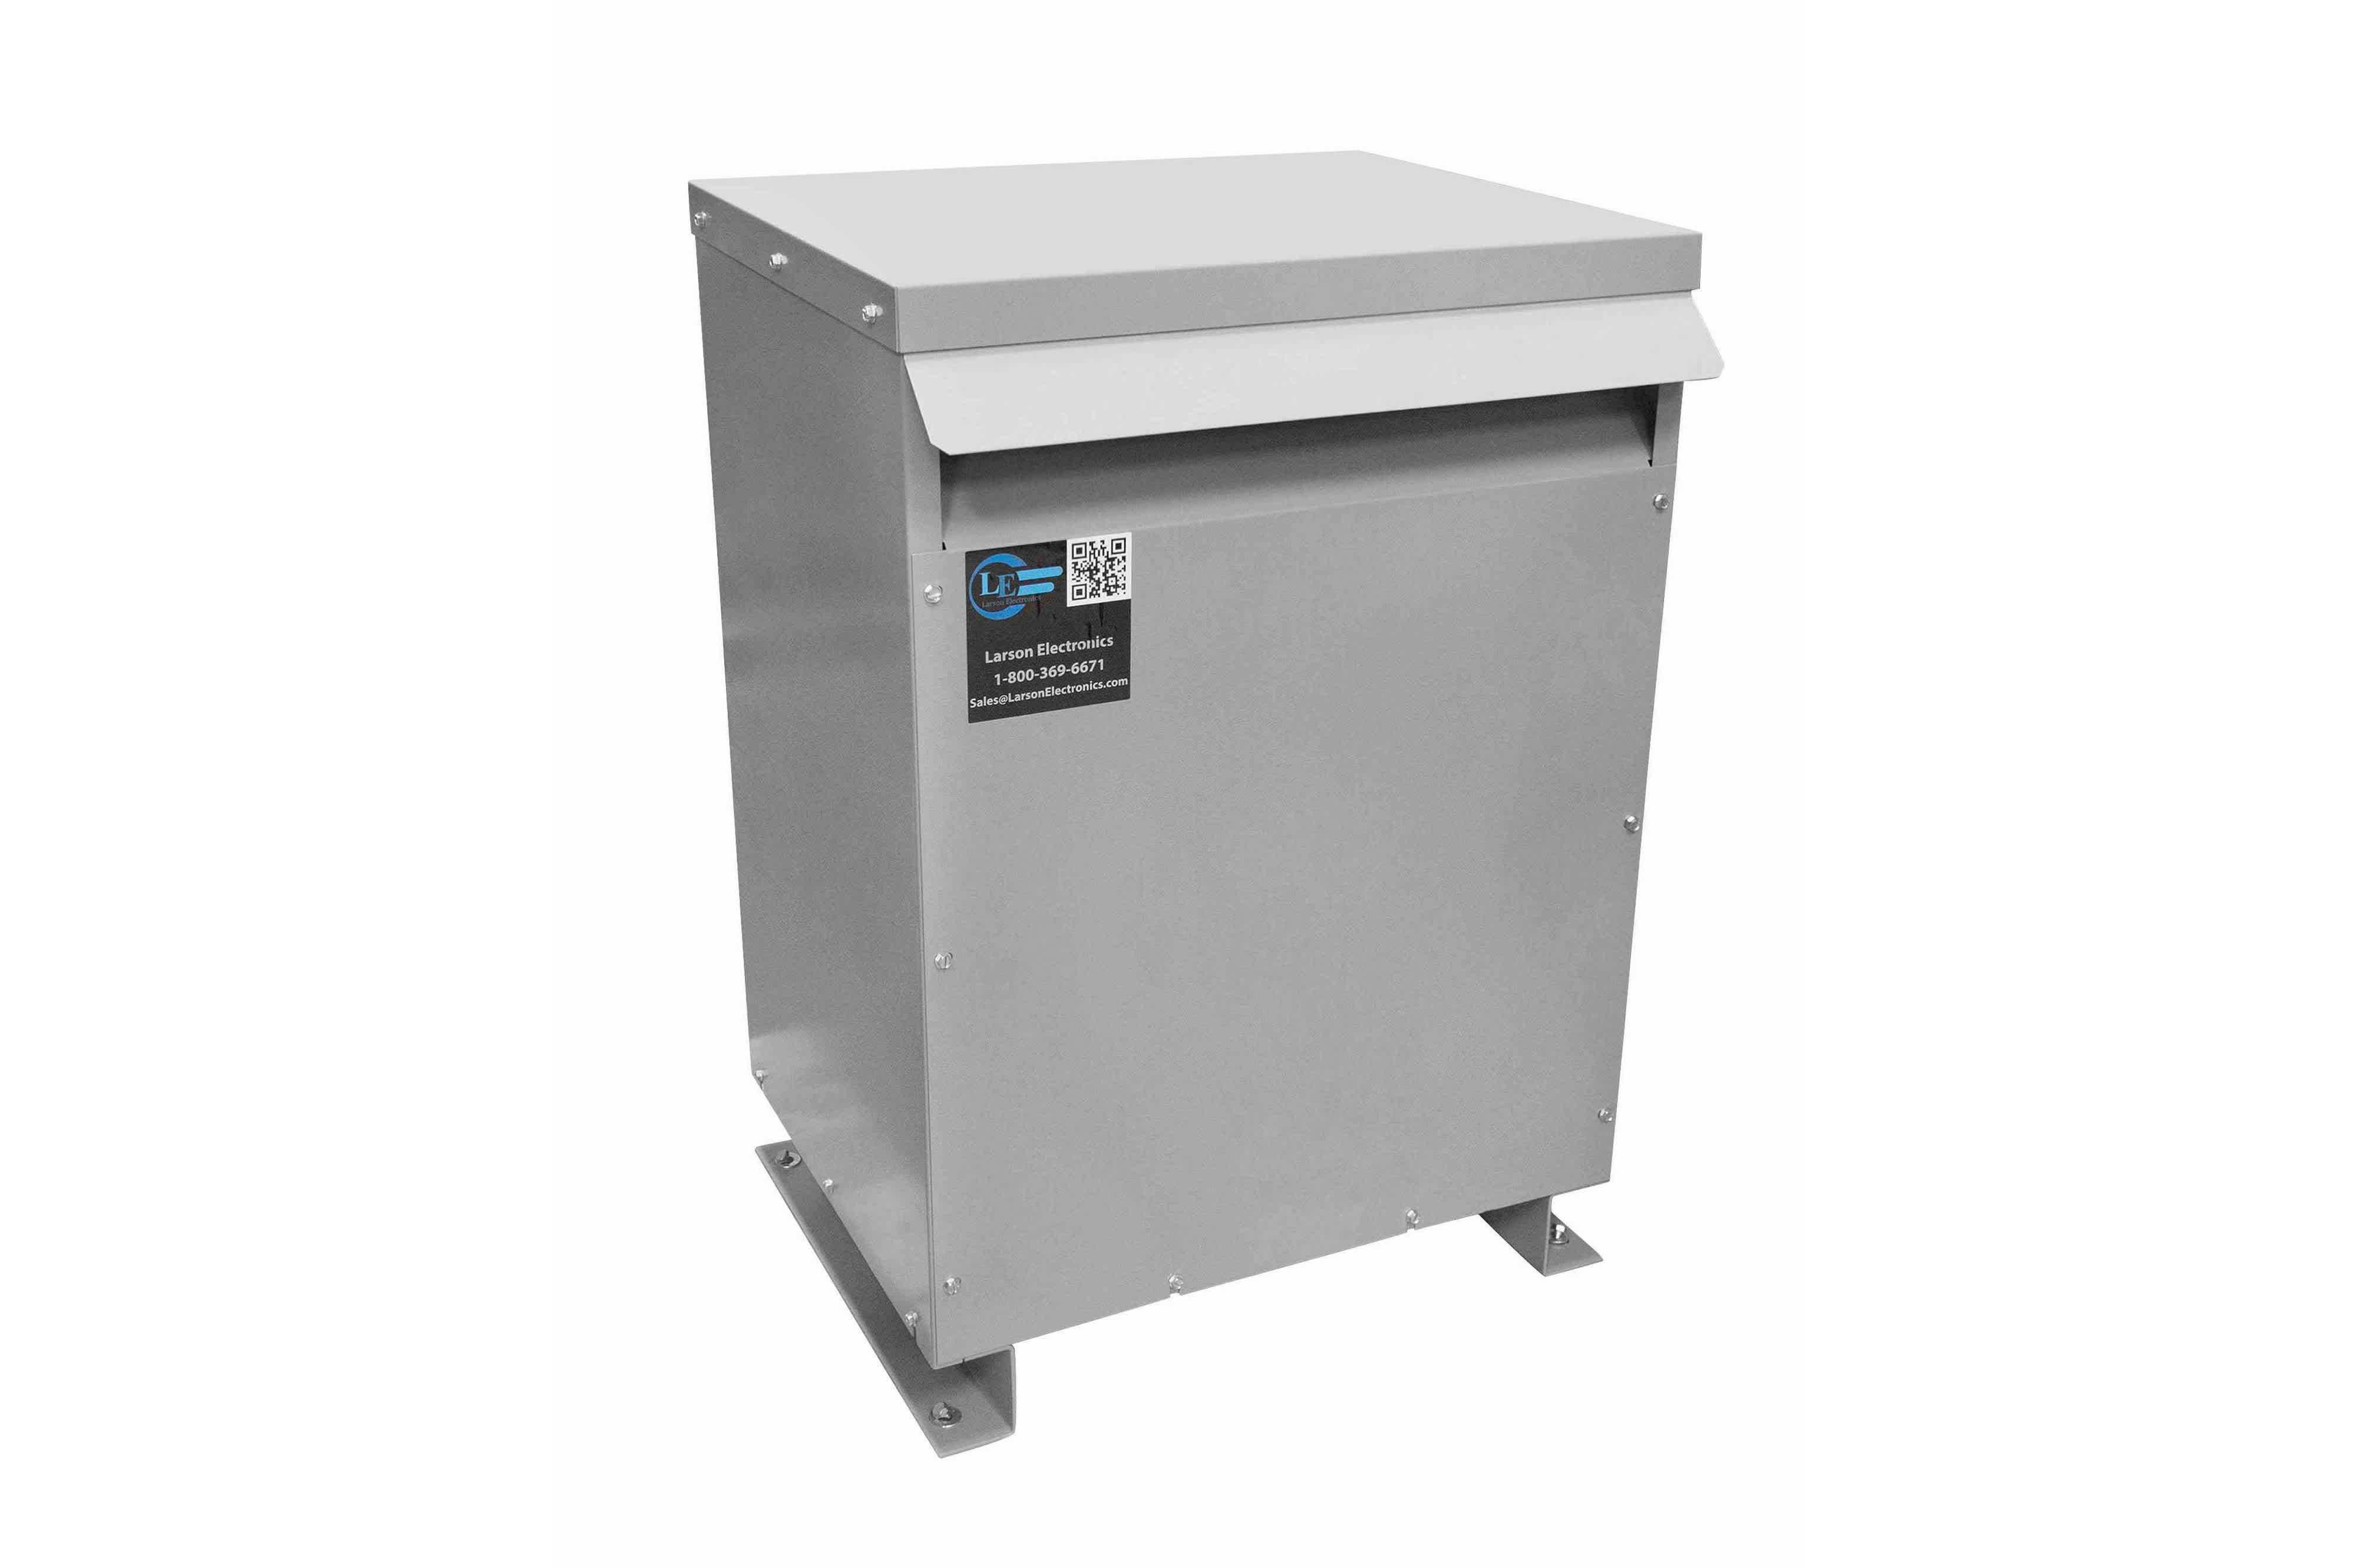 225 kVA 3PH Isolation Transformer, 400V Wye Primary, 480Y/277 Wye-N Secondary, N3R, Ventilated, 60 Hz